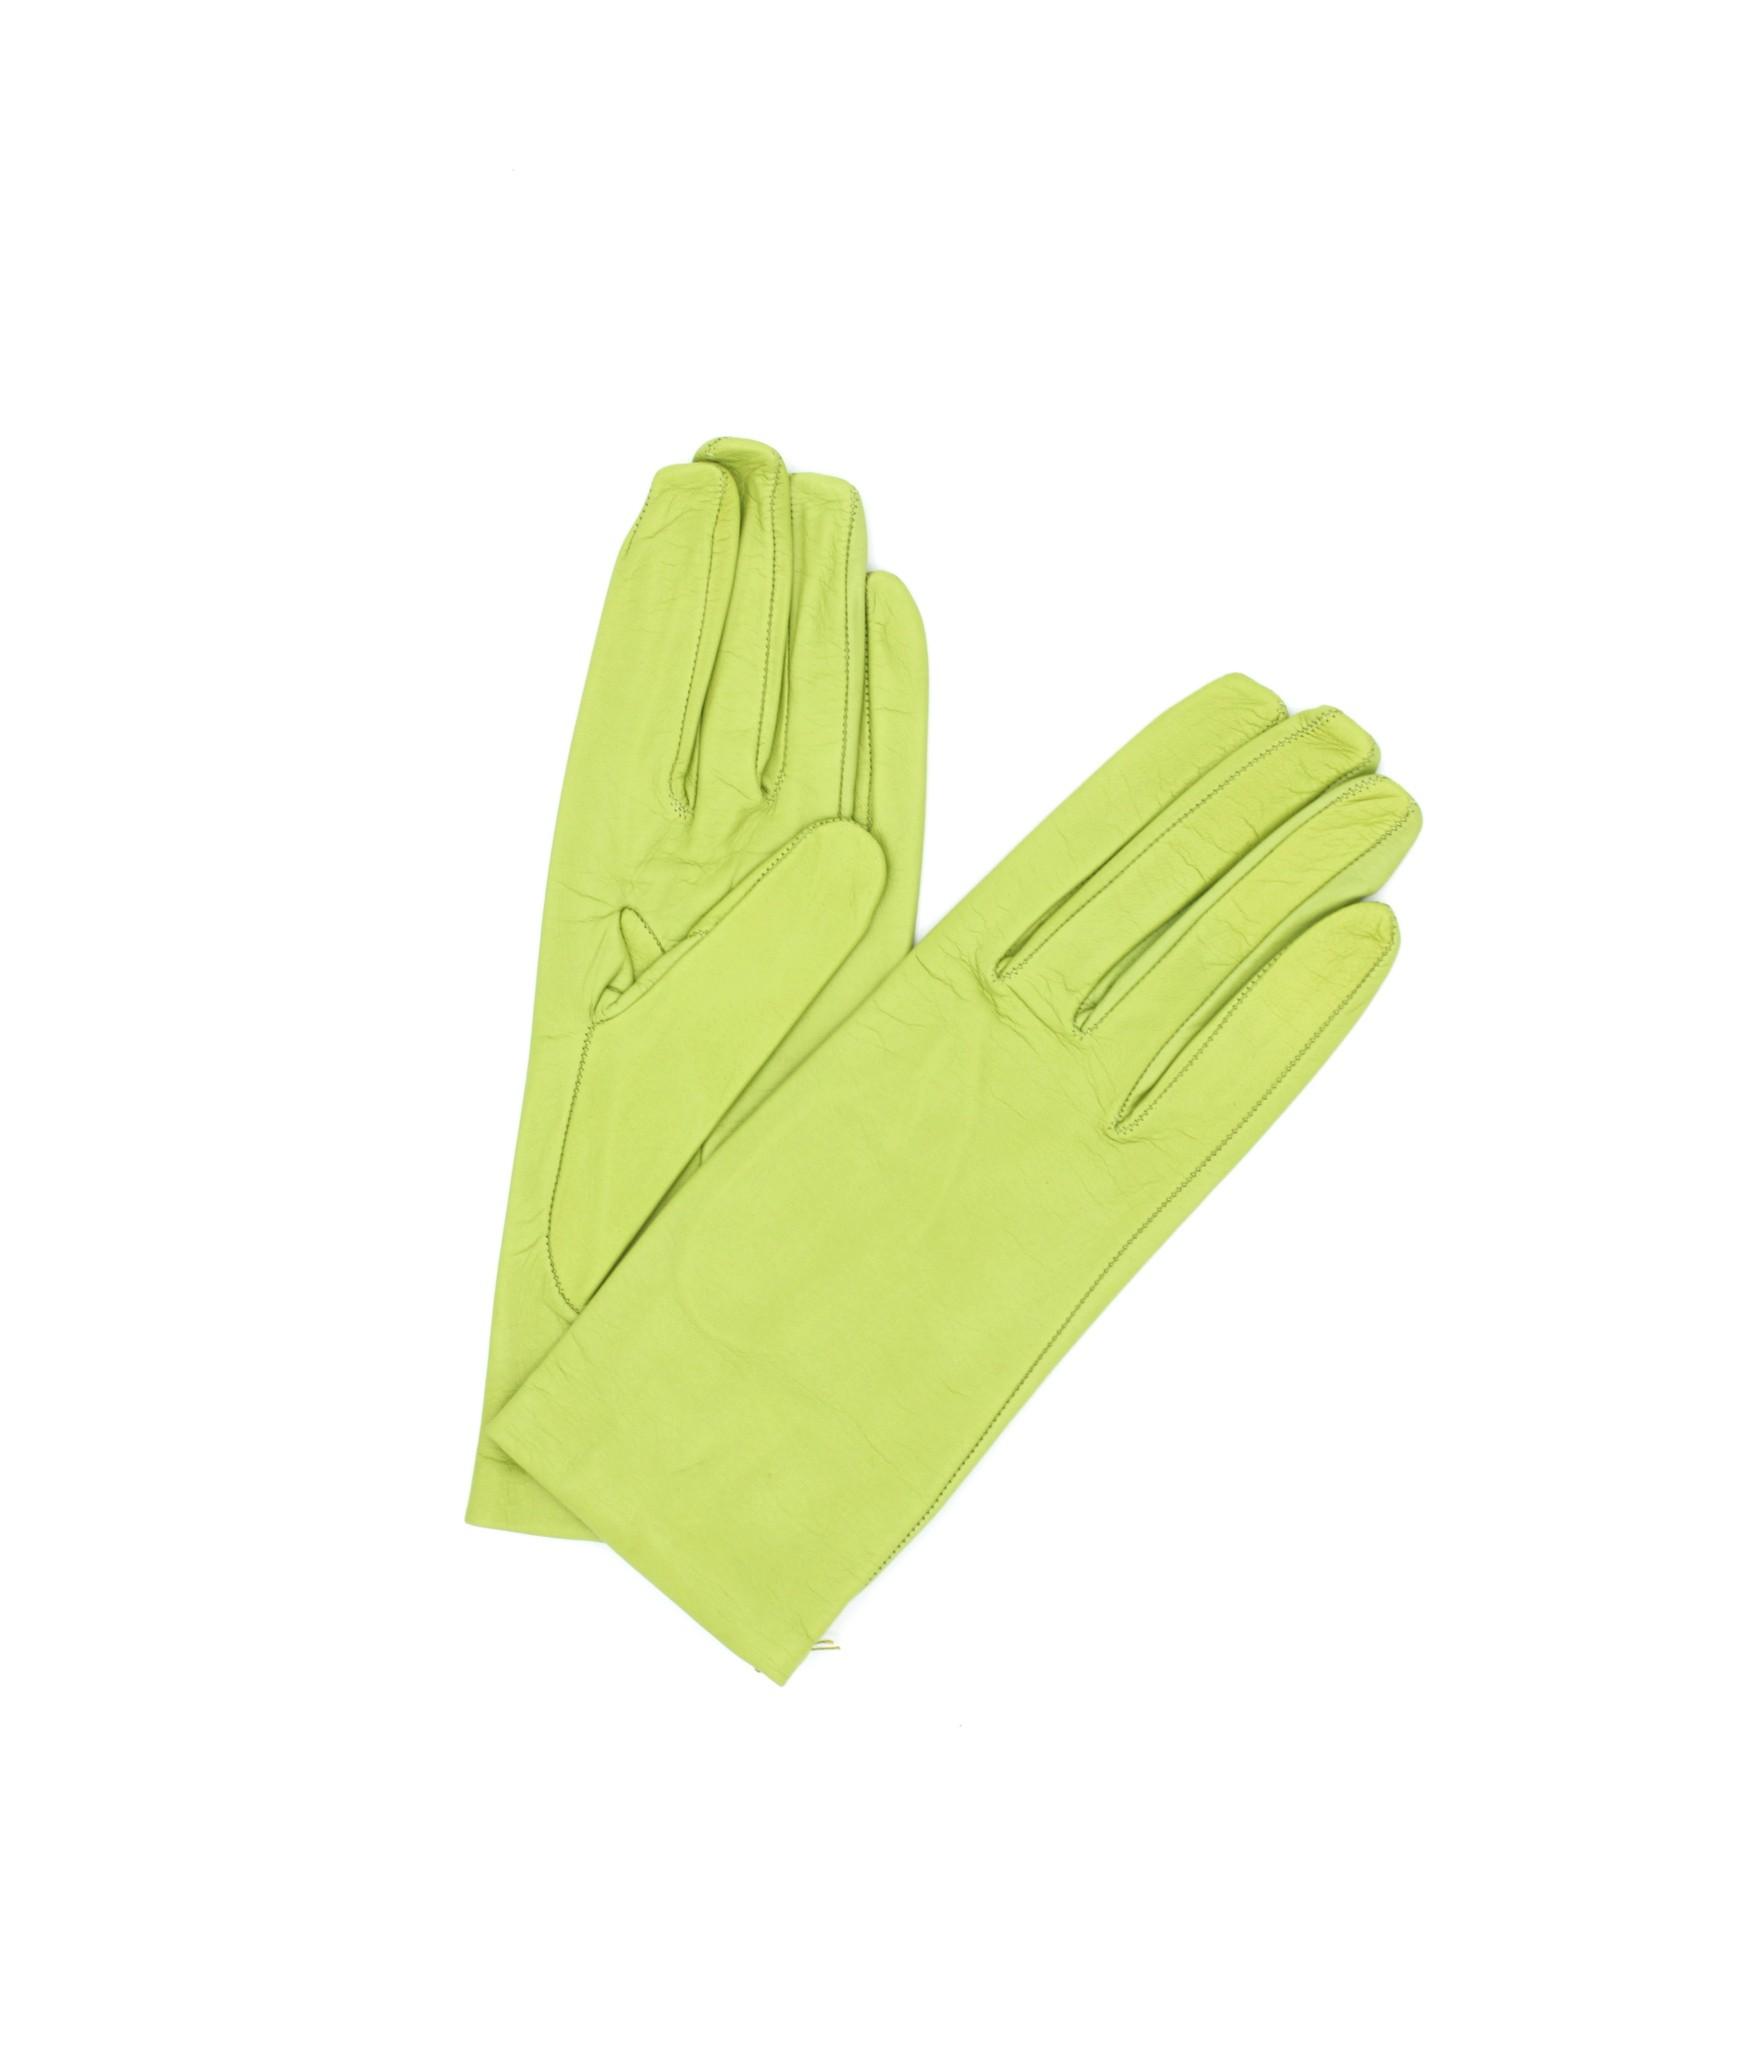 Nappa leather gloves Silk lined Pistachio Sermoneta Gloves